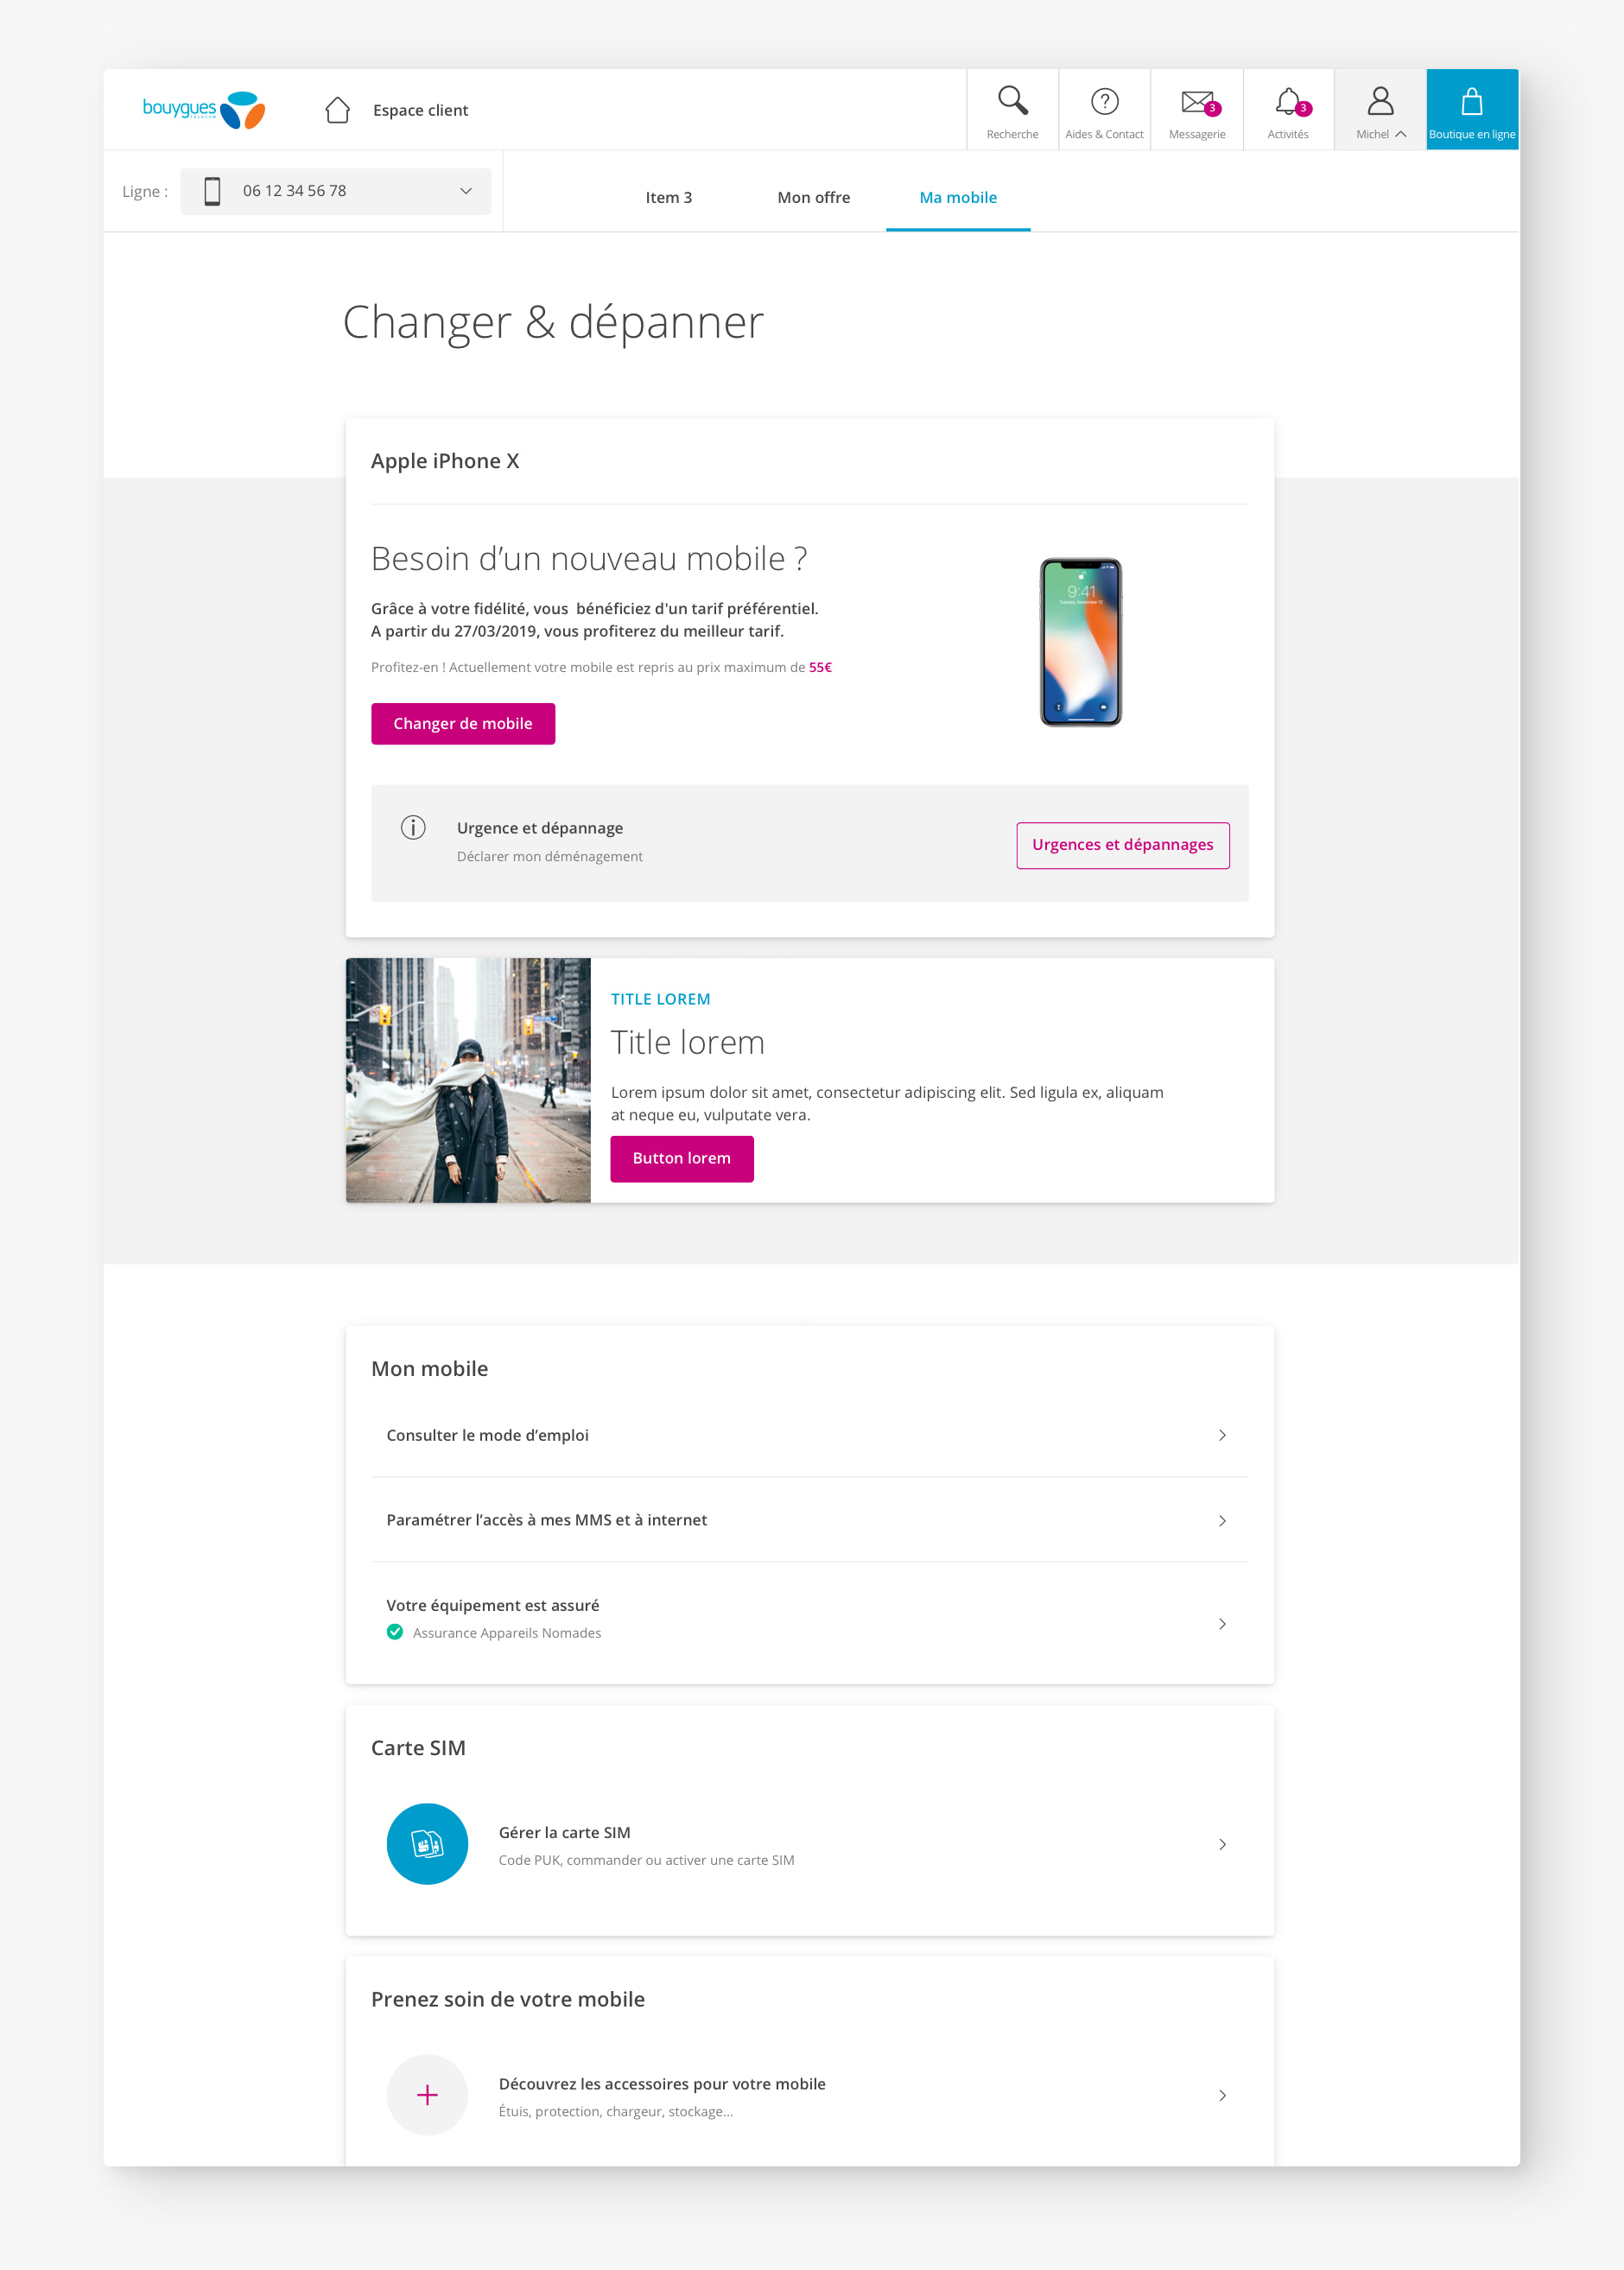 projet-bouygues_telecom-website-robin_p-designer_08@2x